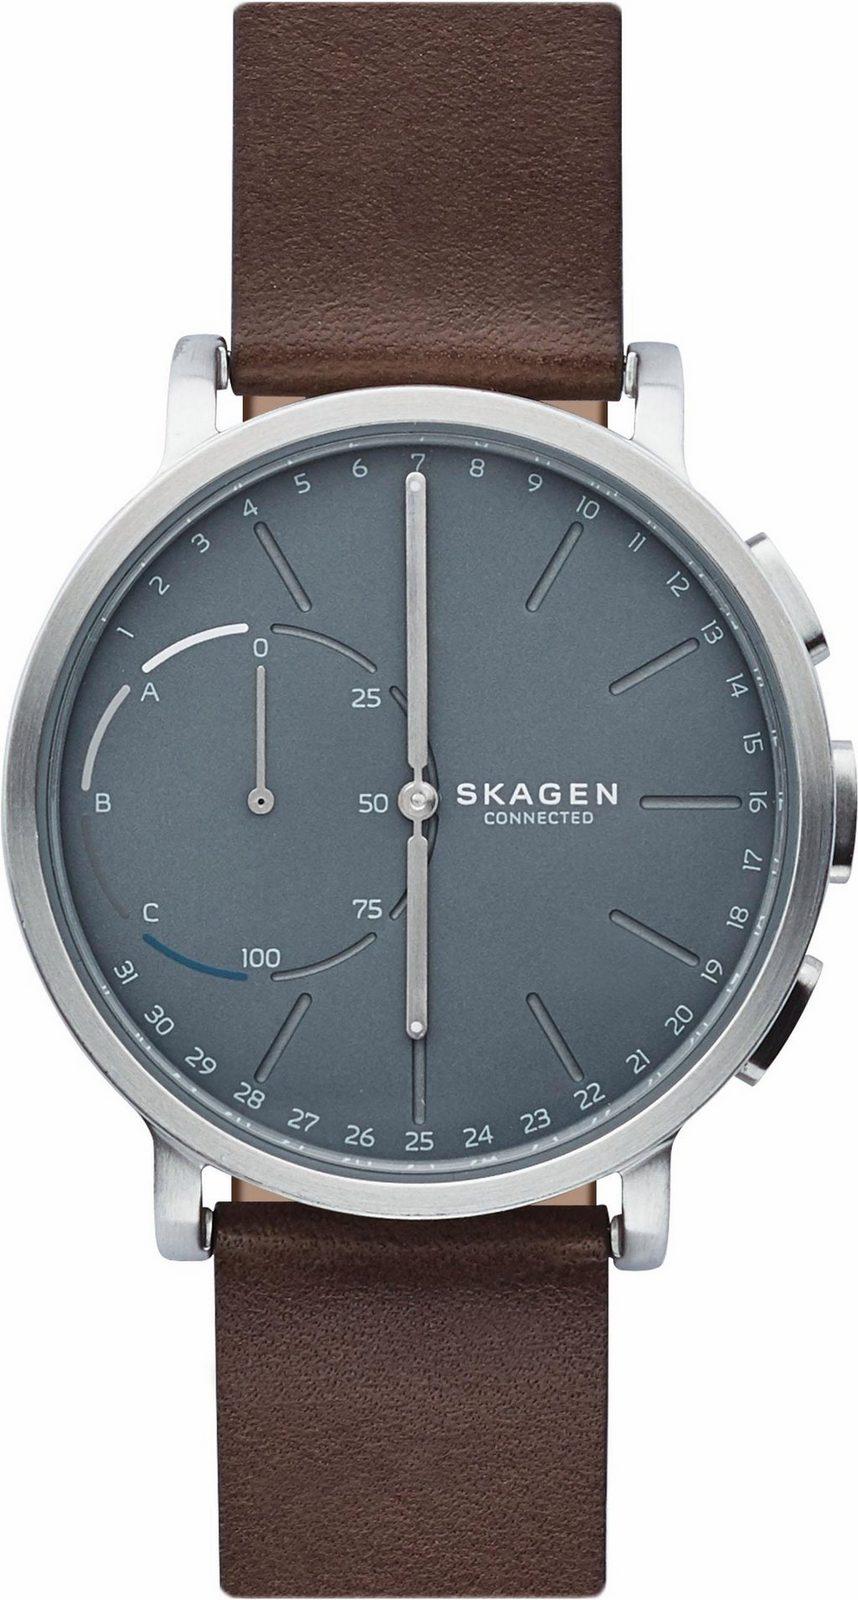 SKAGEN CONNECTED HAGEN CONNECTED, SKT1110 Smartwatch (Android Wear)